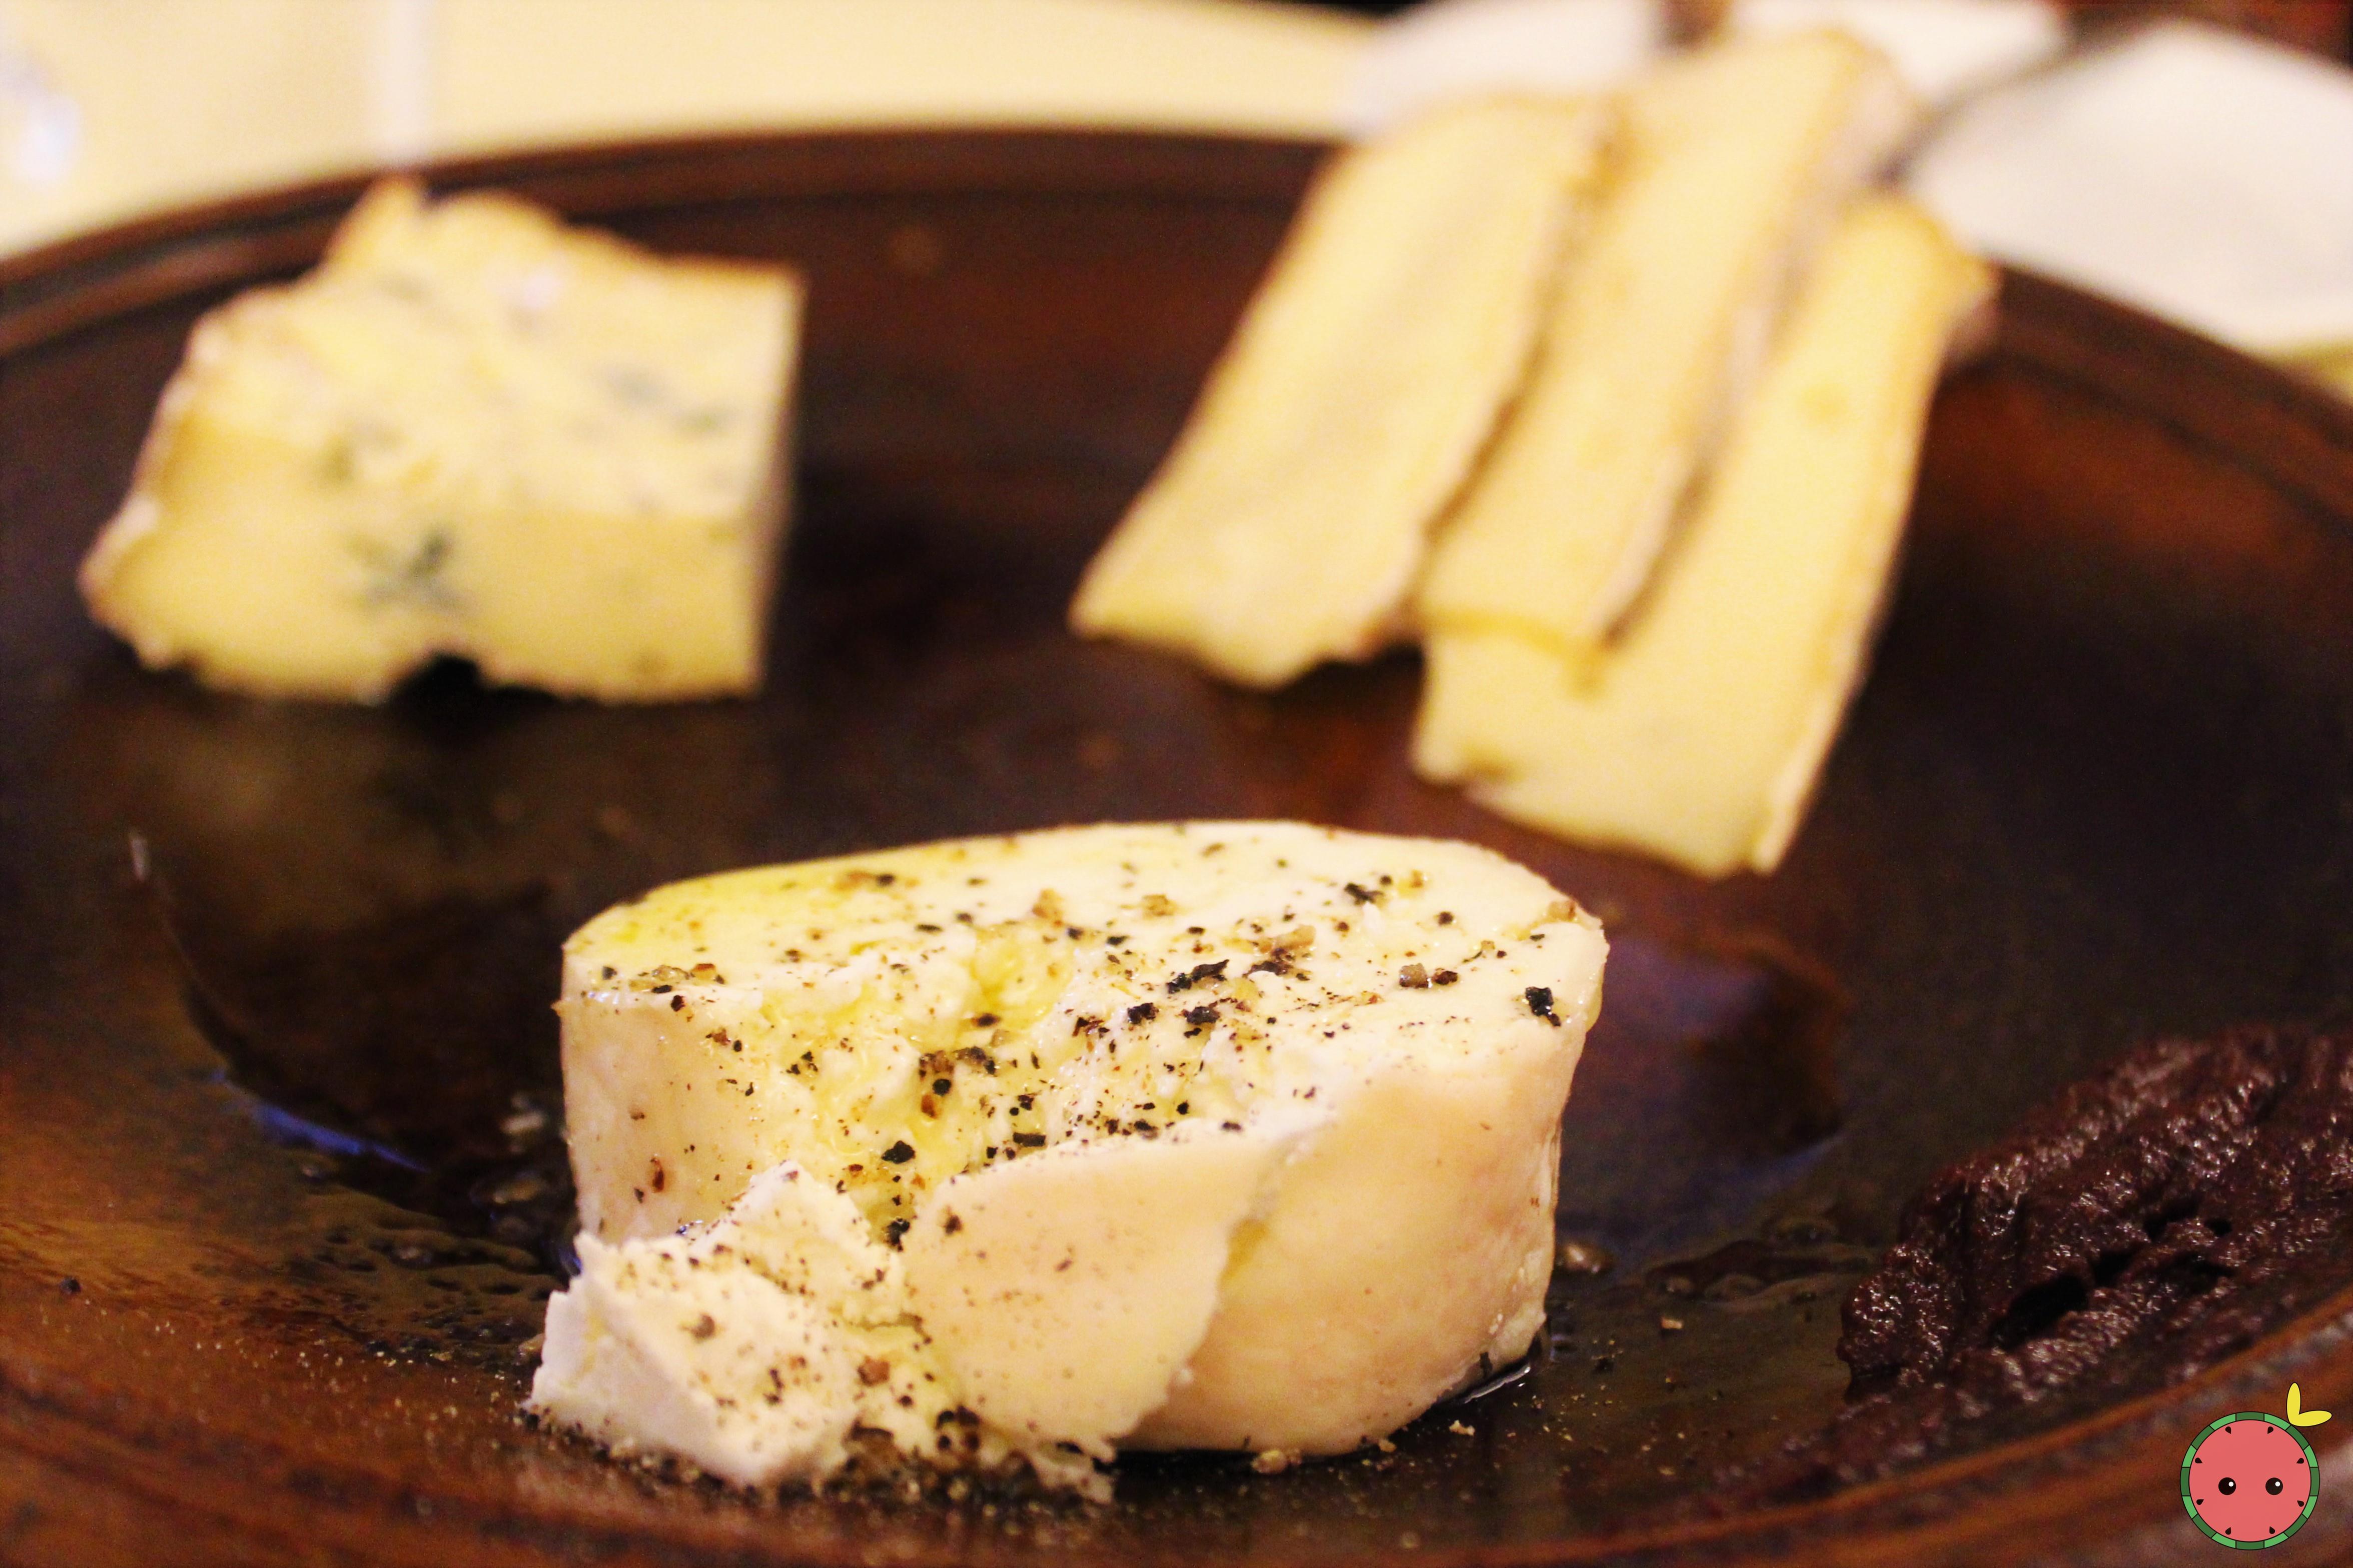 Cheese Plate - Saint Nectaire, fourme d'Ambert, Crottin de Chavignol